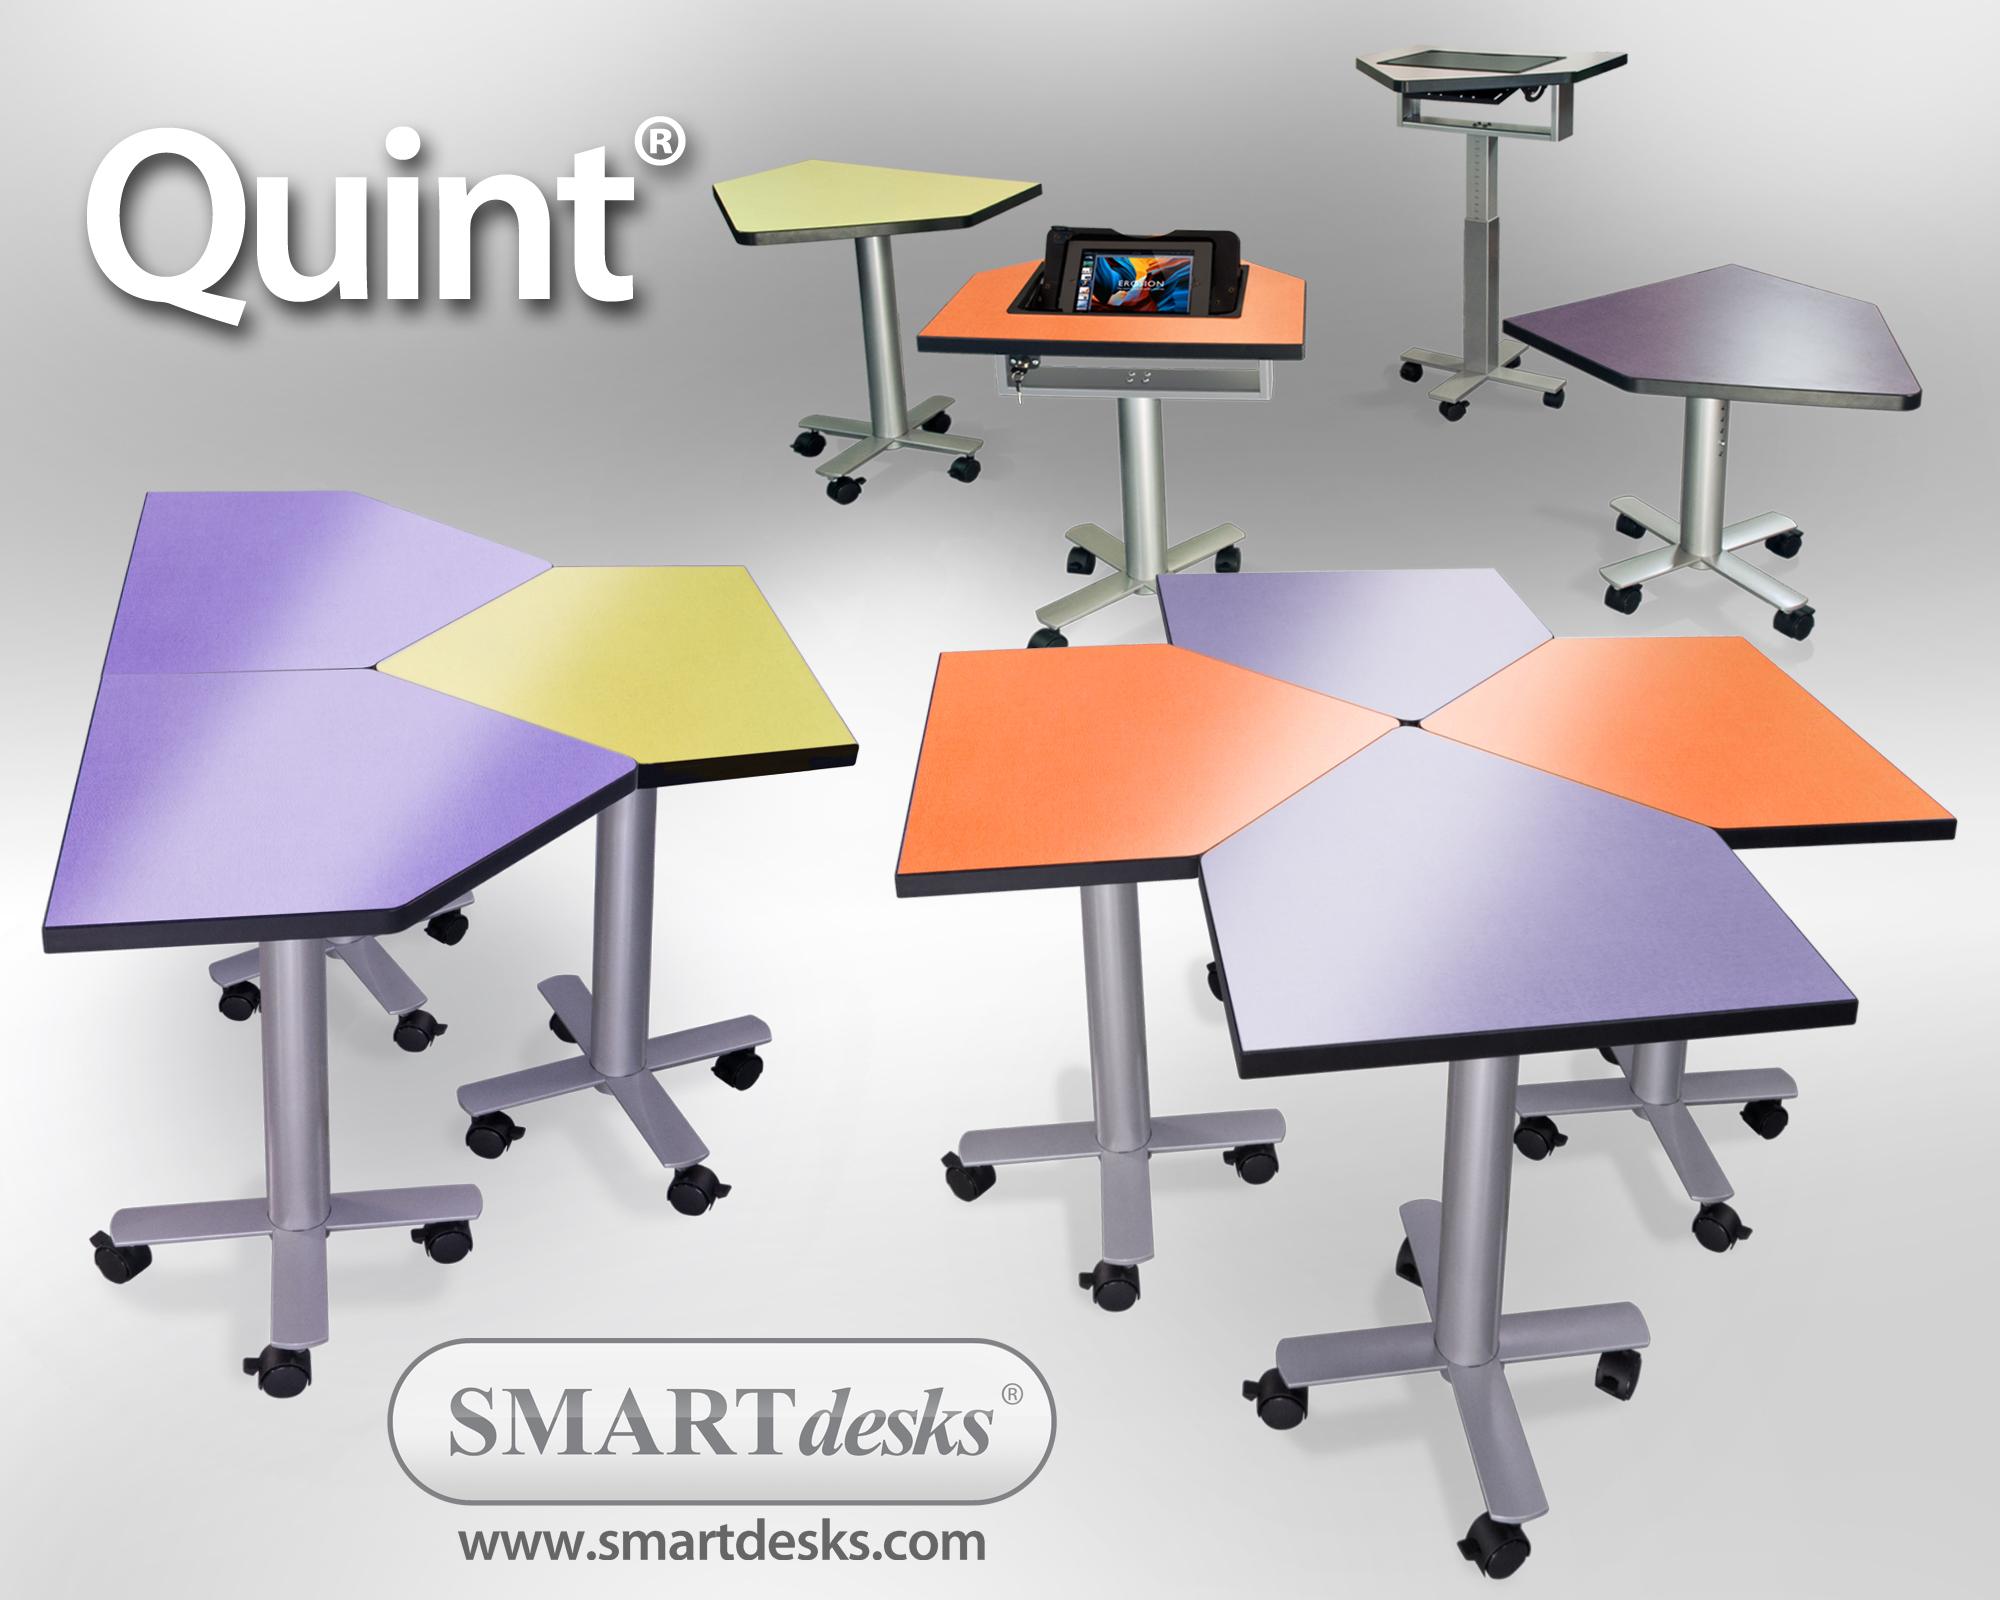 Smartdesks quint ipad classroom desks win platinum adex for Tables and desks in the classroom